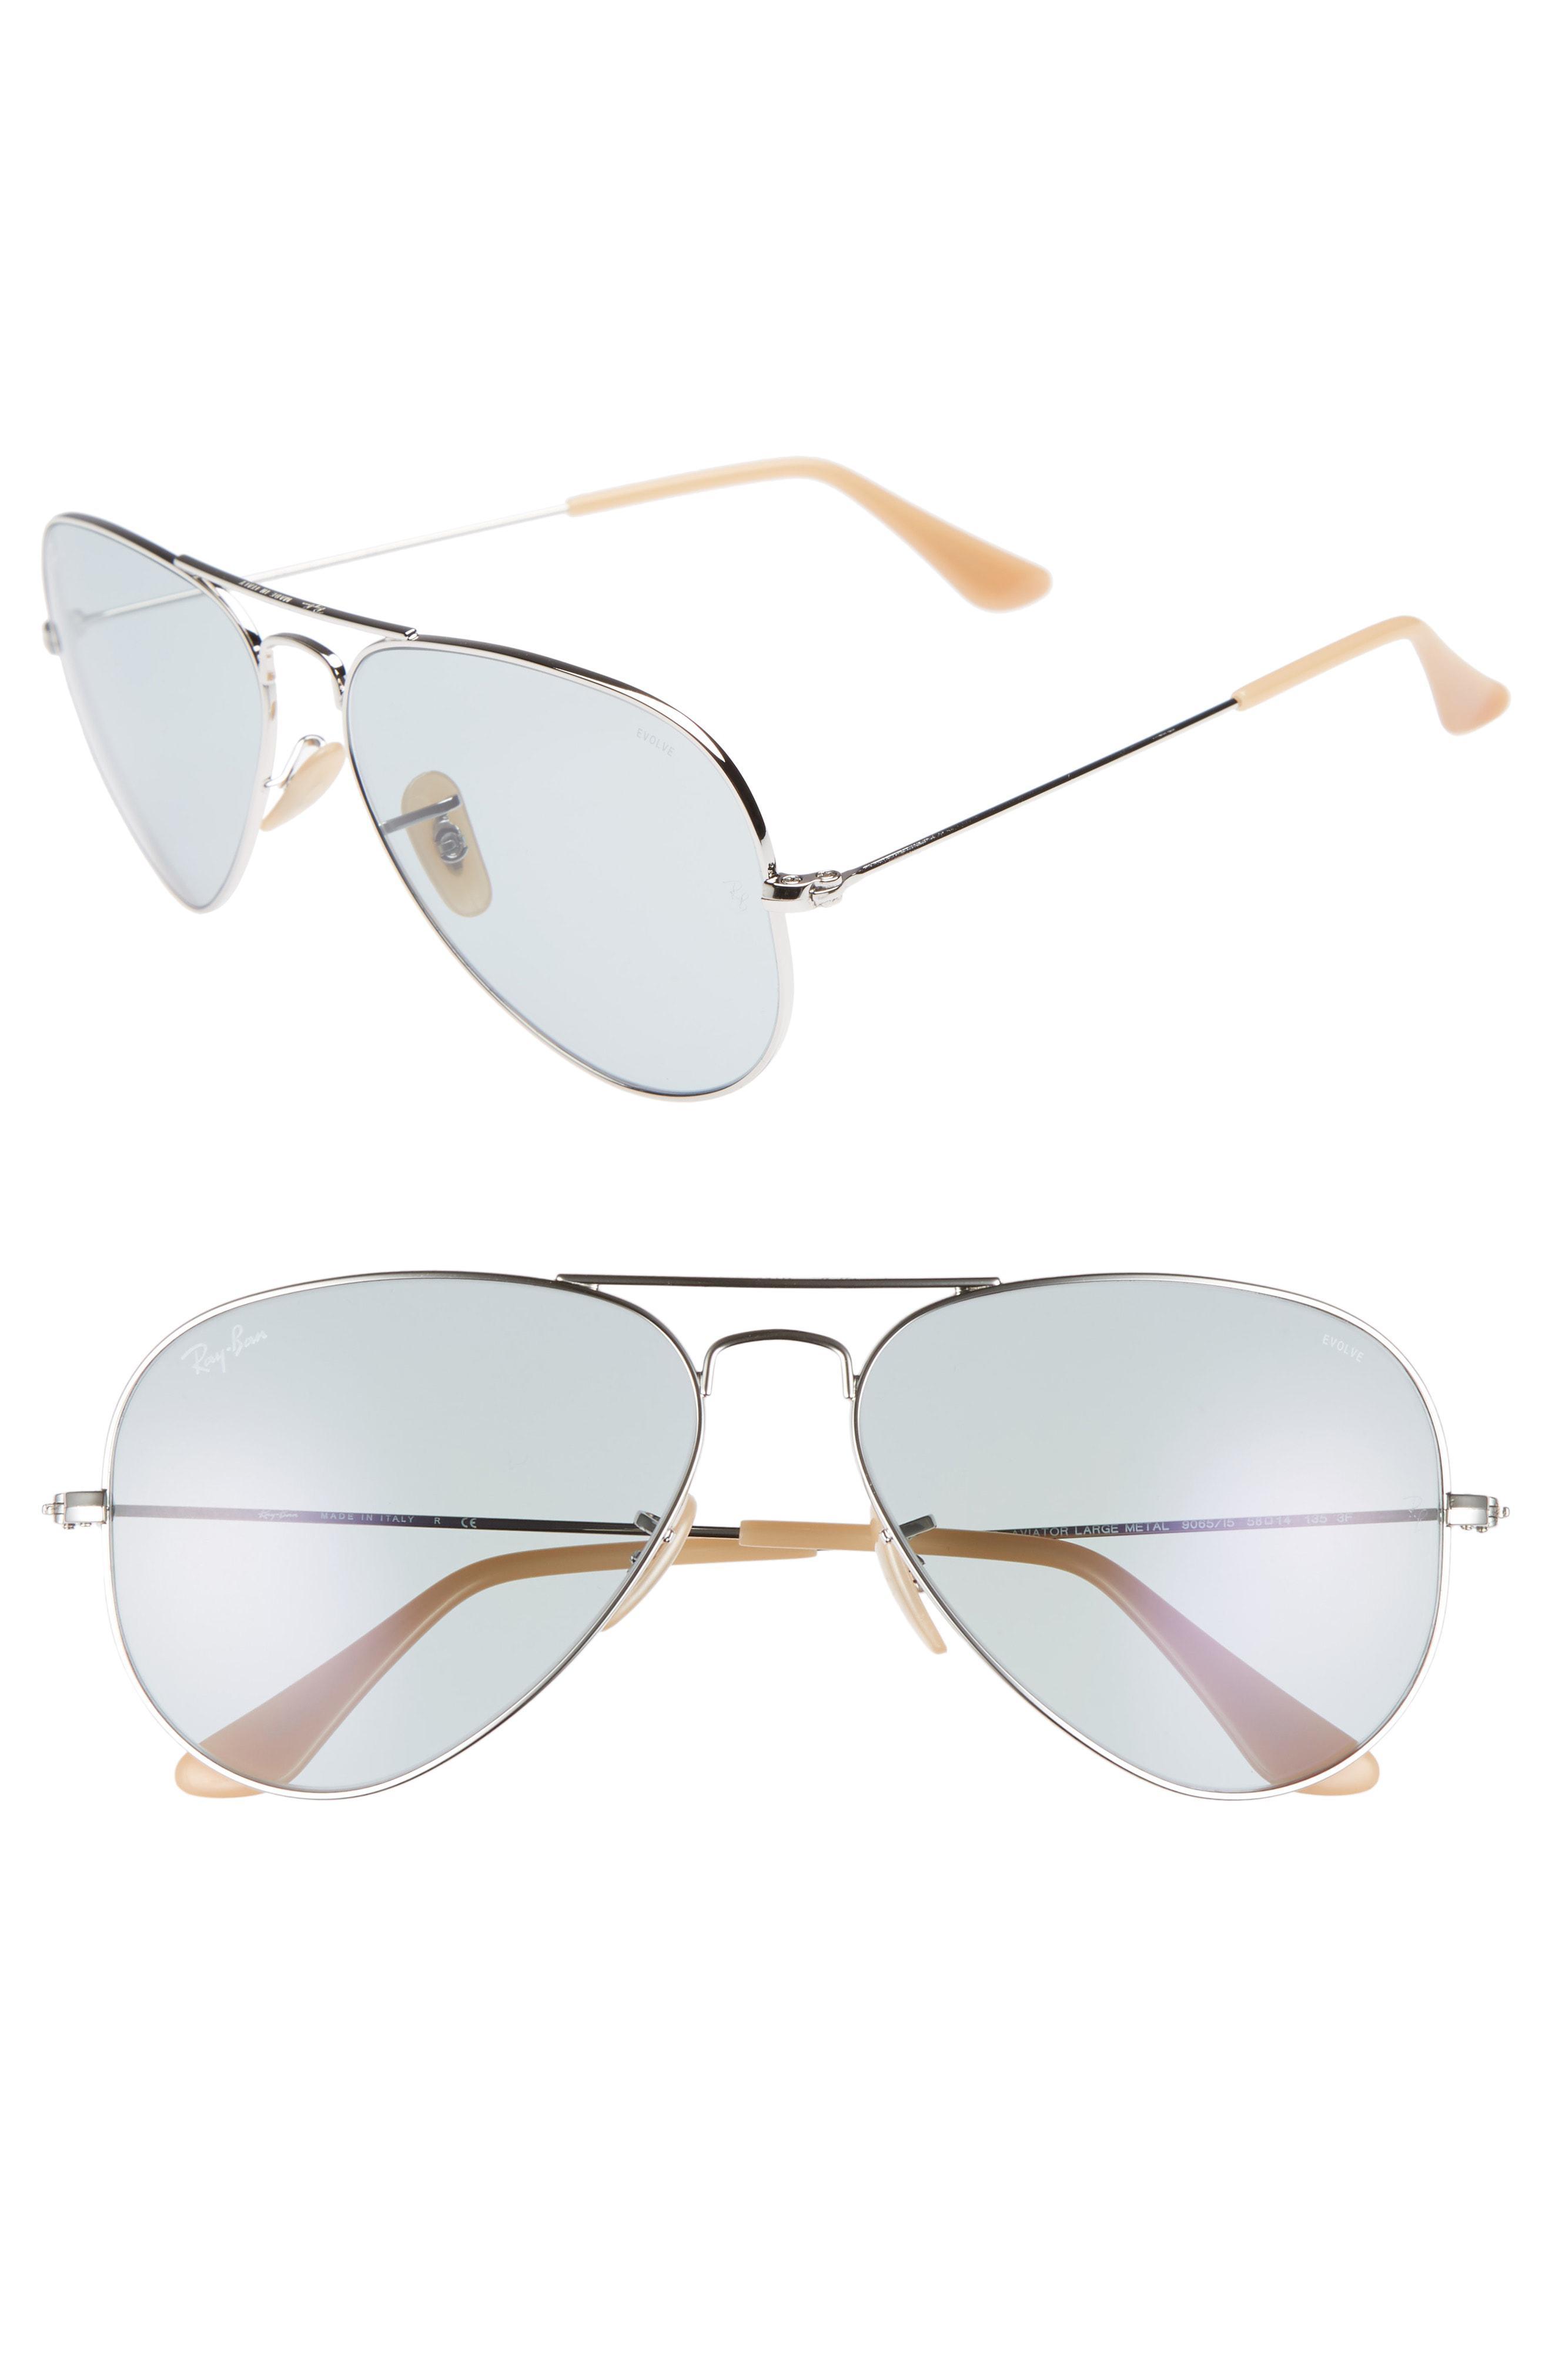 44c7419e947 Ray-Ban Evolve 58mm Polarized Aviator Sunglasses - for Men - Lyst